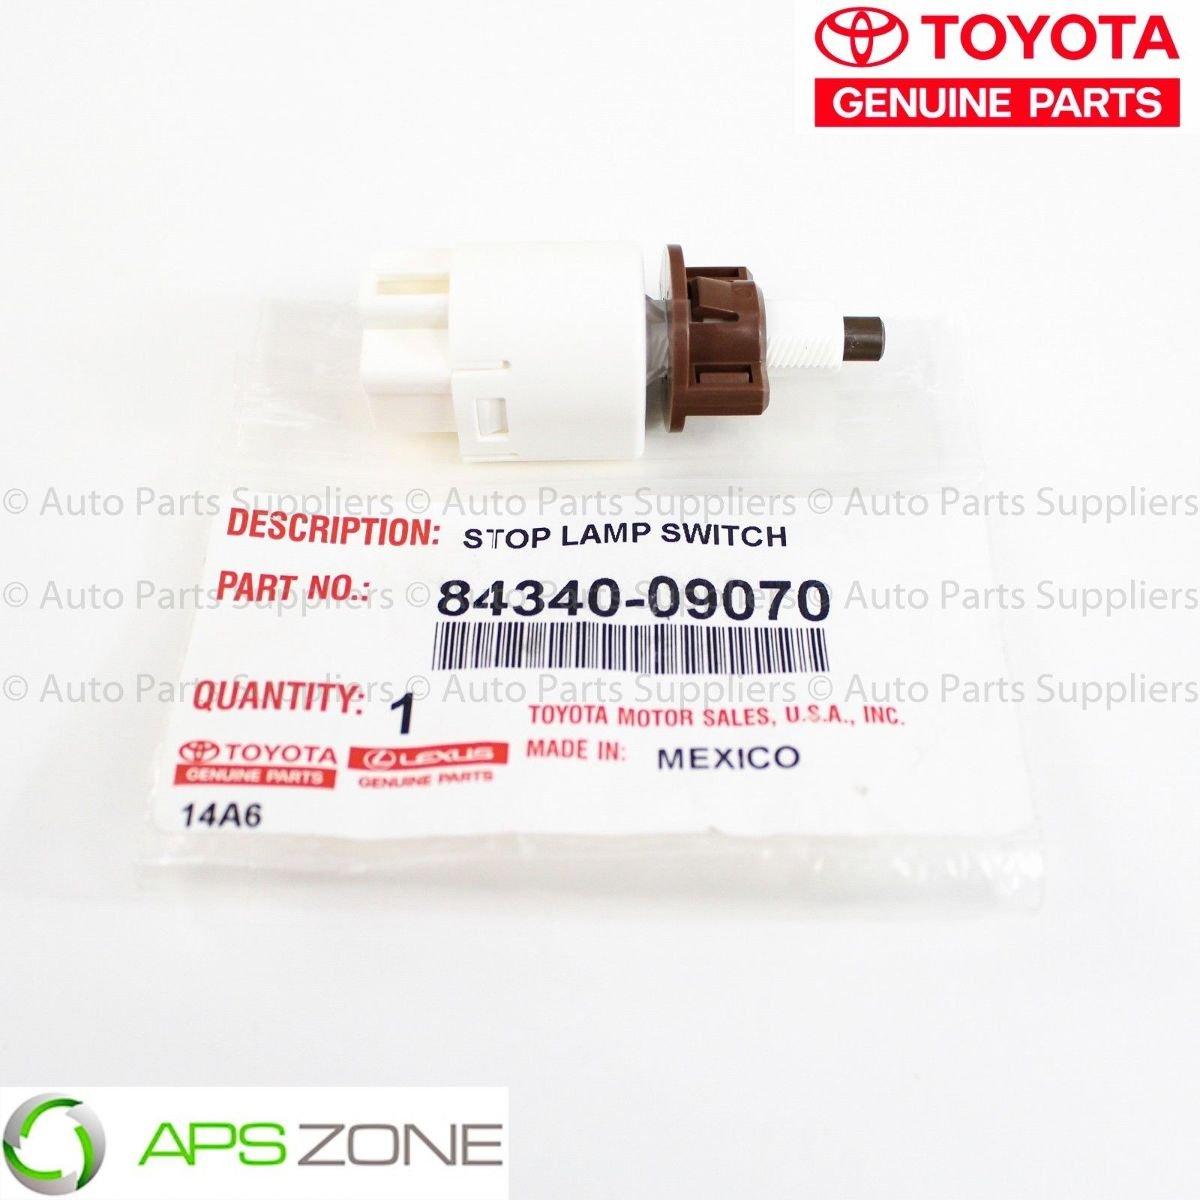 Toyota 84340-09070 Brake Light Switch by Toyota